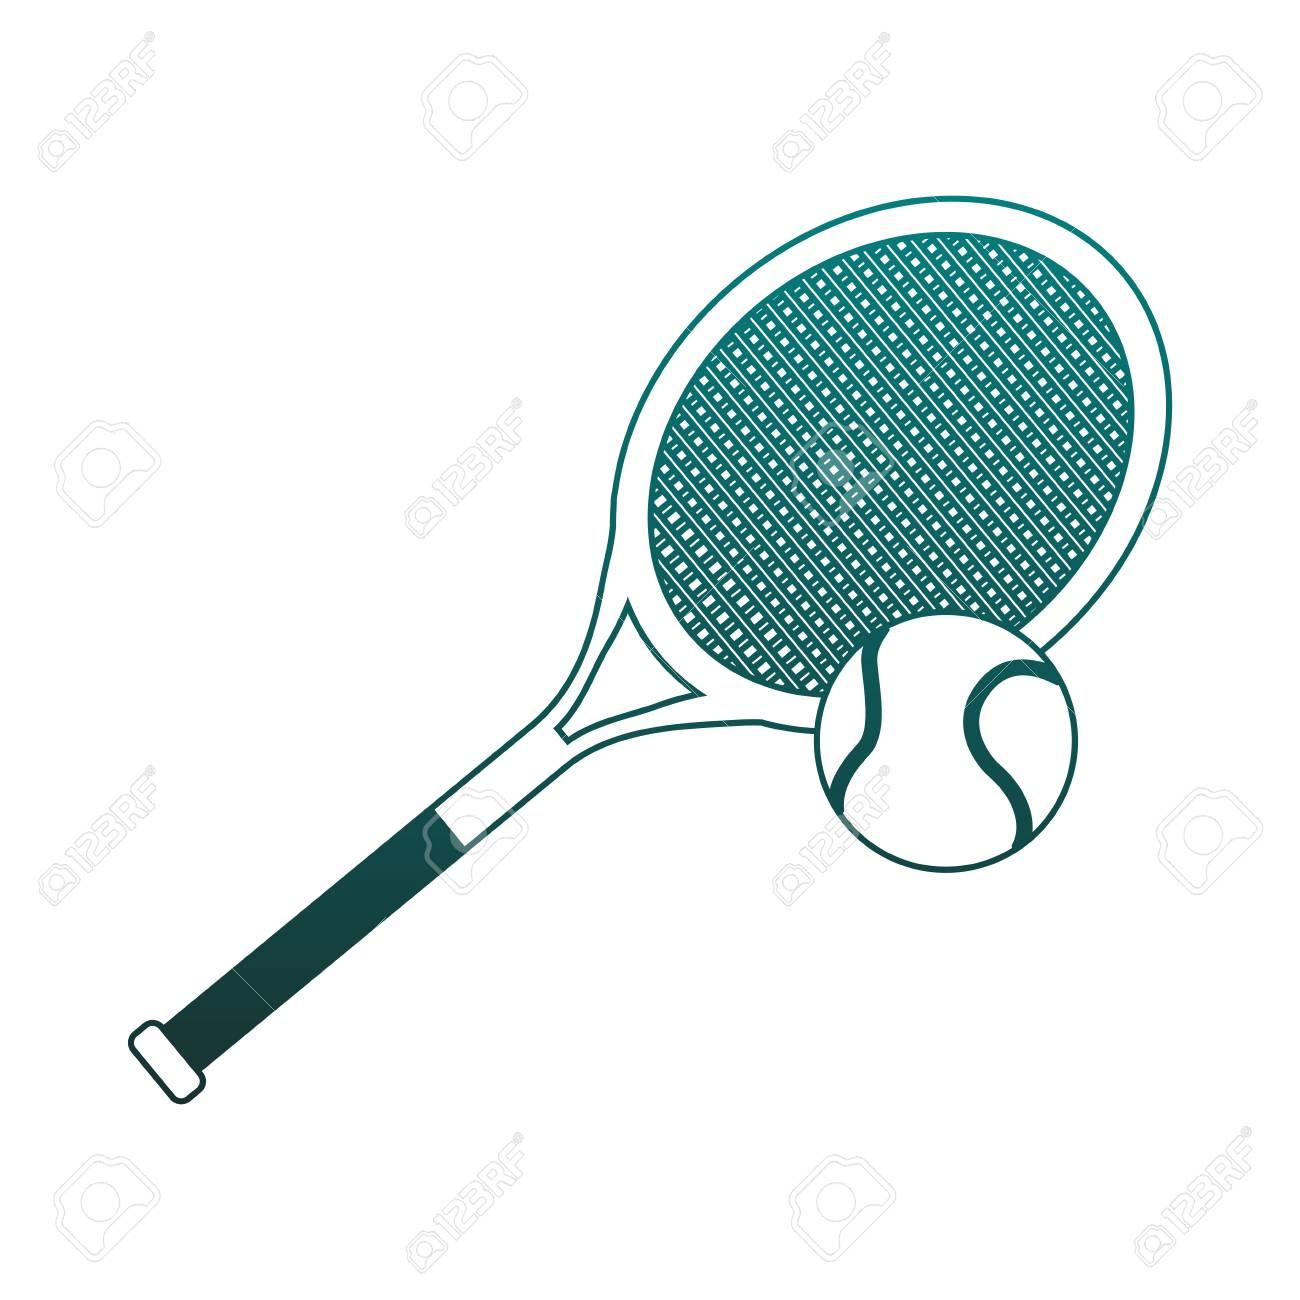 Tennis Racket Equipment Vector Illustration Graphic Design Royalty